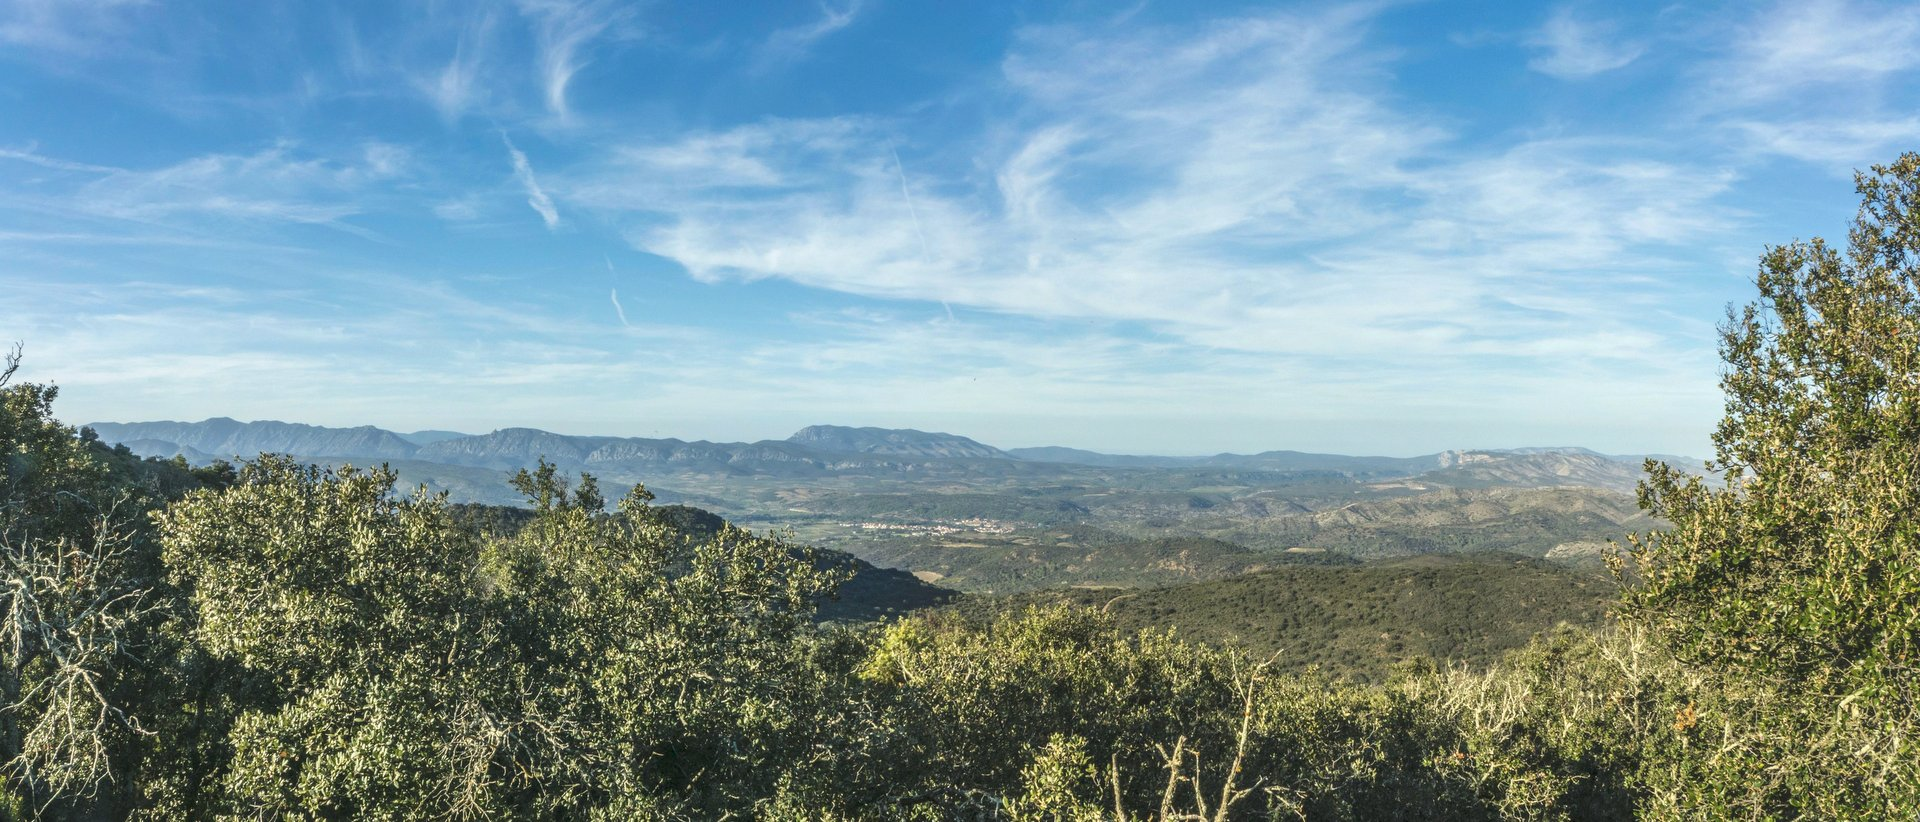 Nördliches Panorama auf dem Força Réal